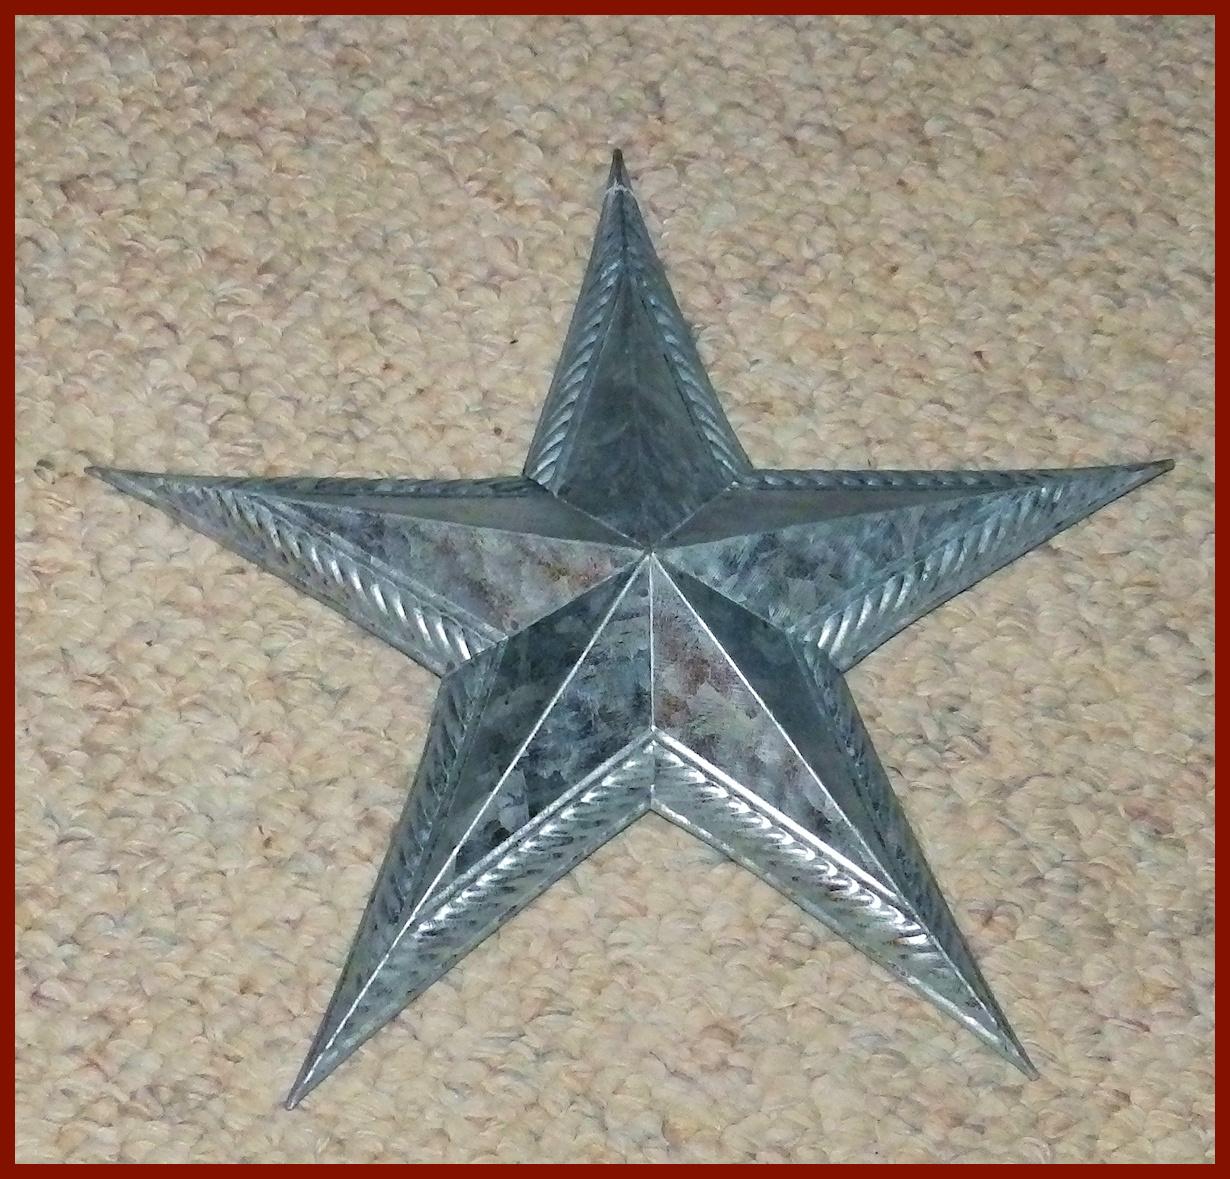 metal-star-12-inch-galvanized-15t208.jpg